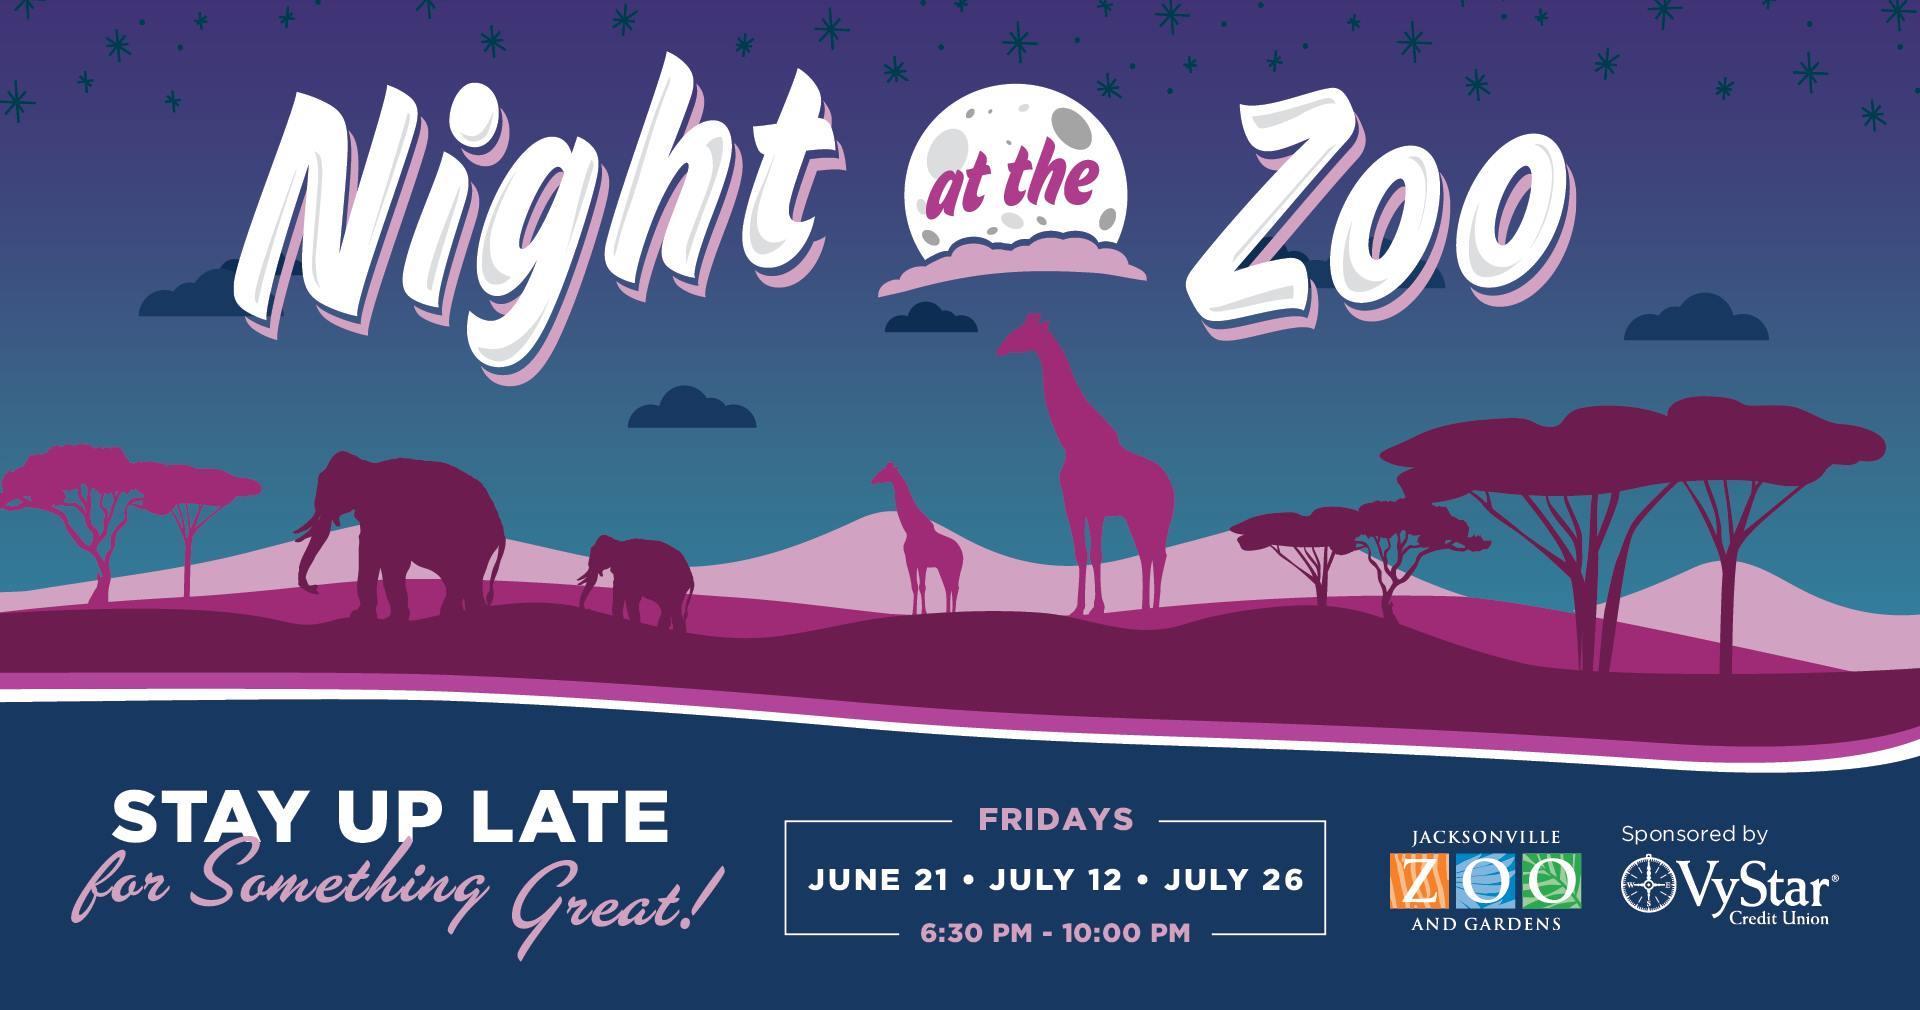 Night at the Zoo